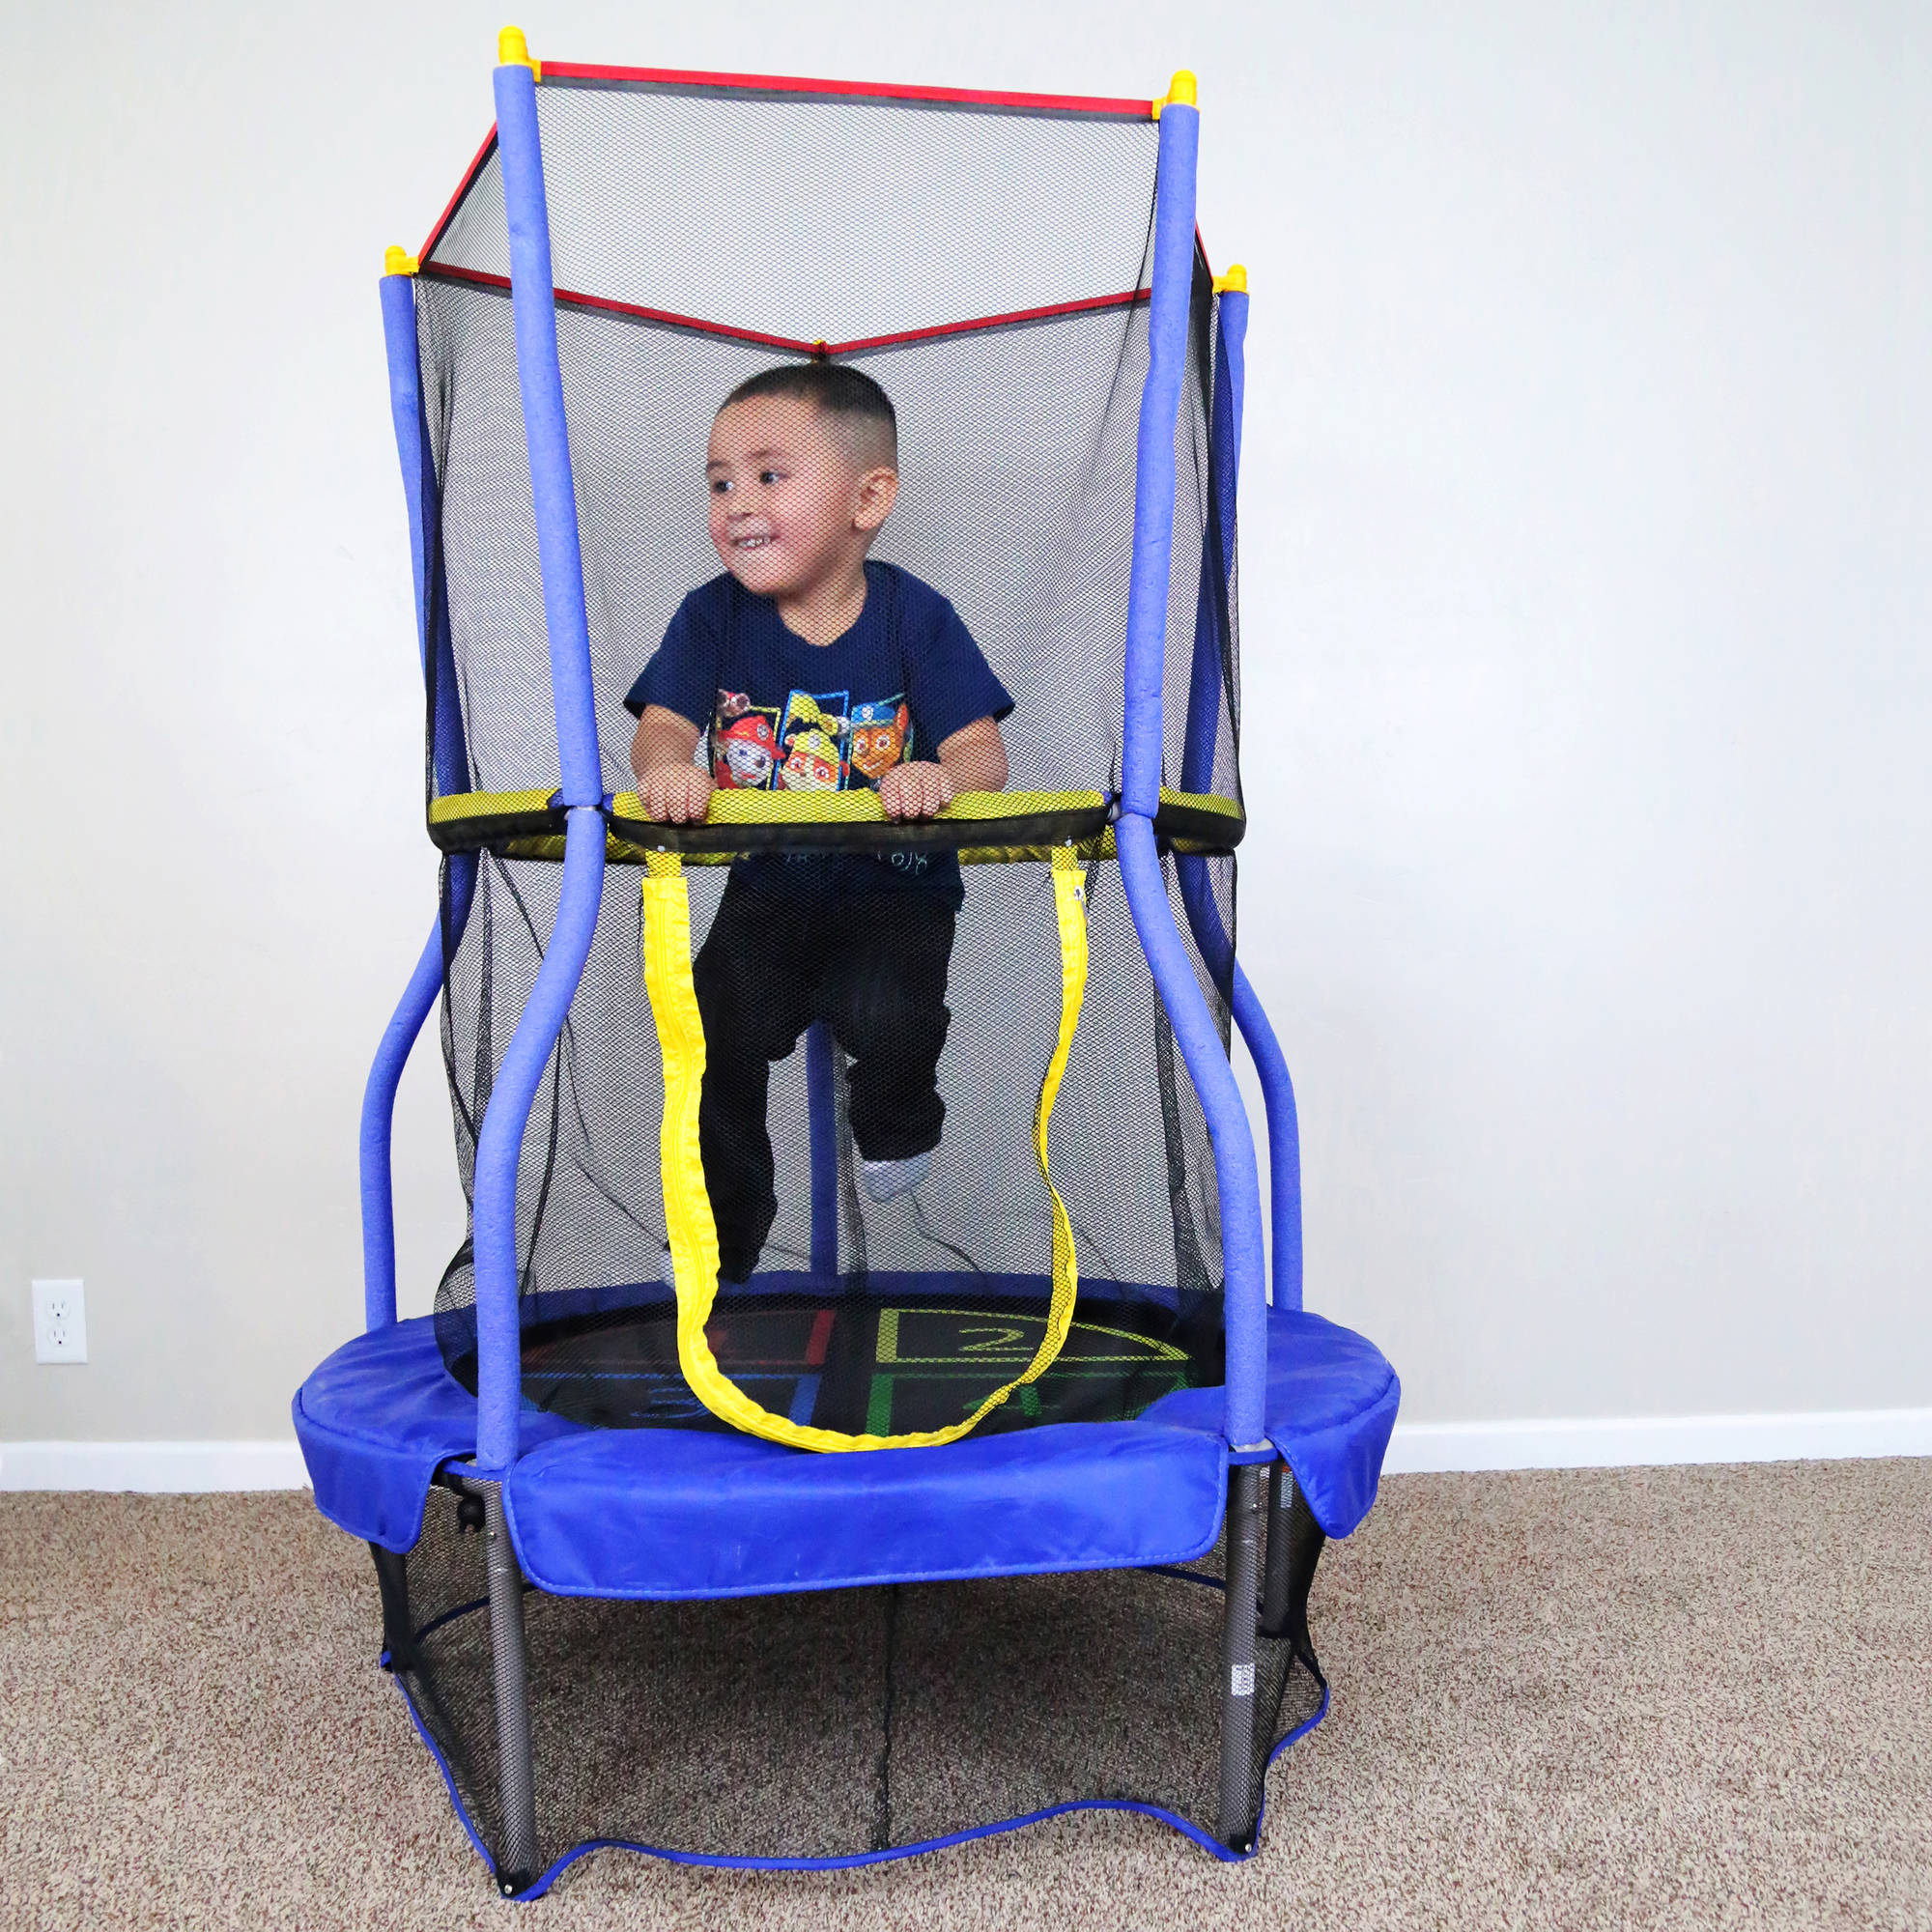 "Skywalker Trampolines Bounce-N-Learn 40"" Trampoline with Enclosure"